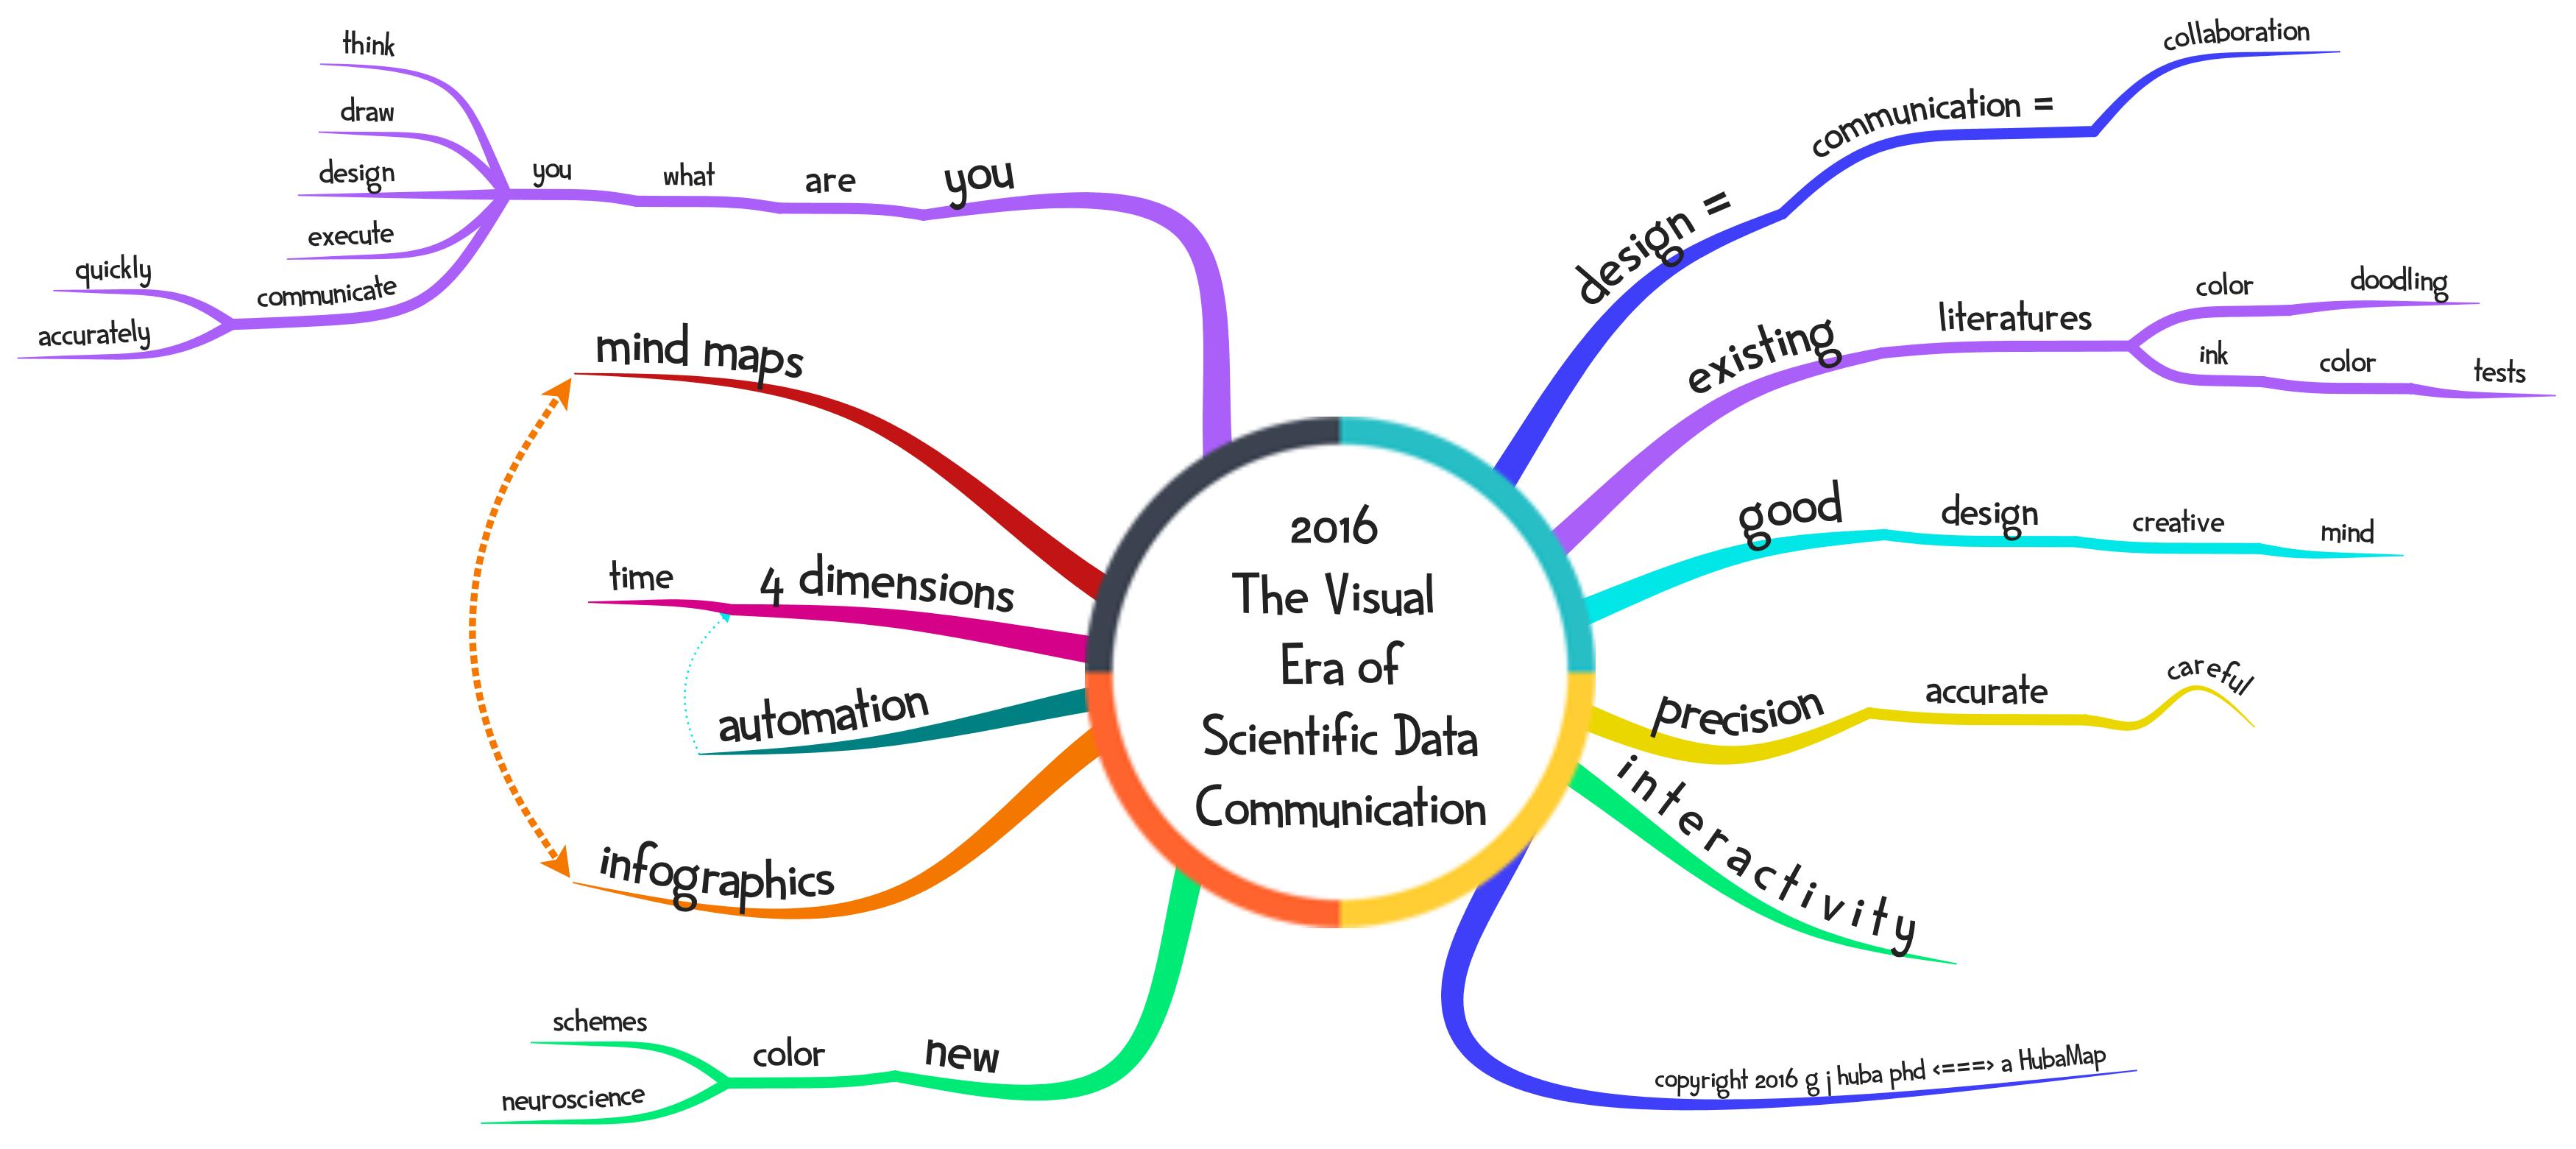 2016 The Visual Era of Scientific Data Communication